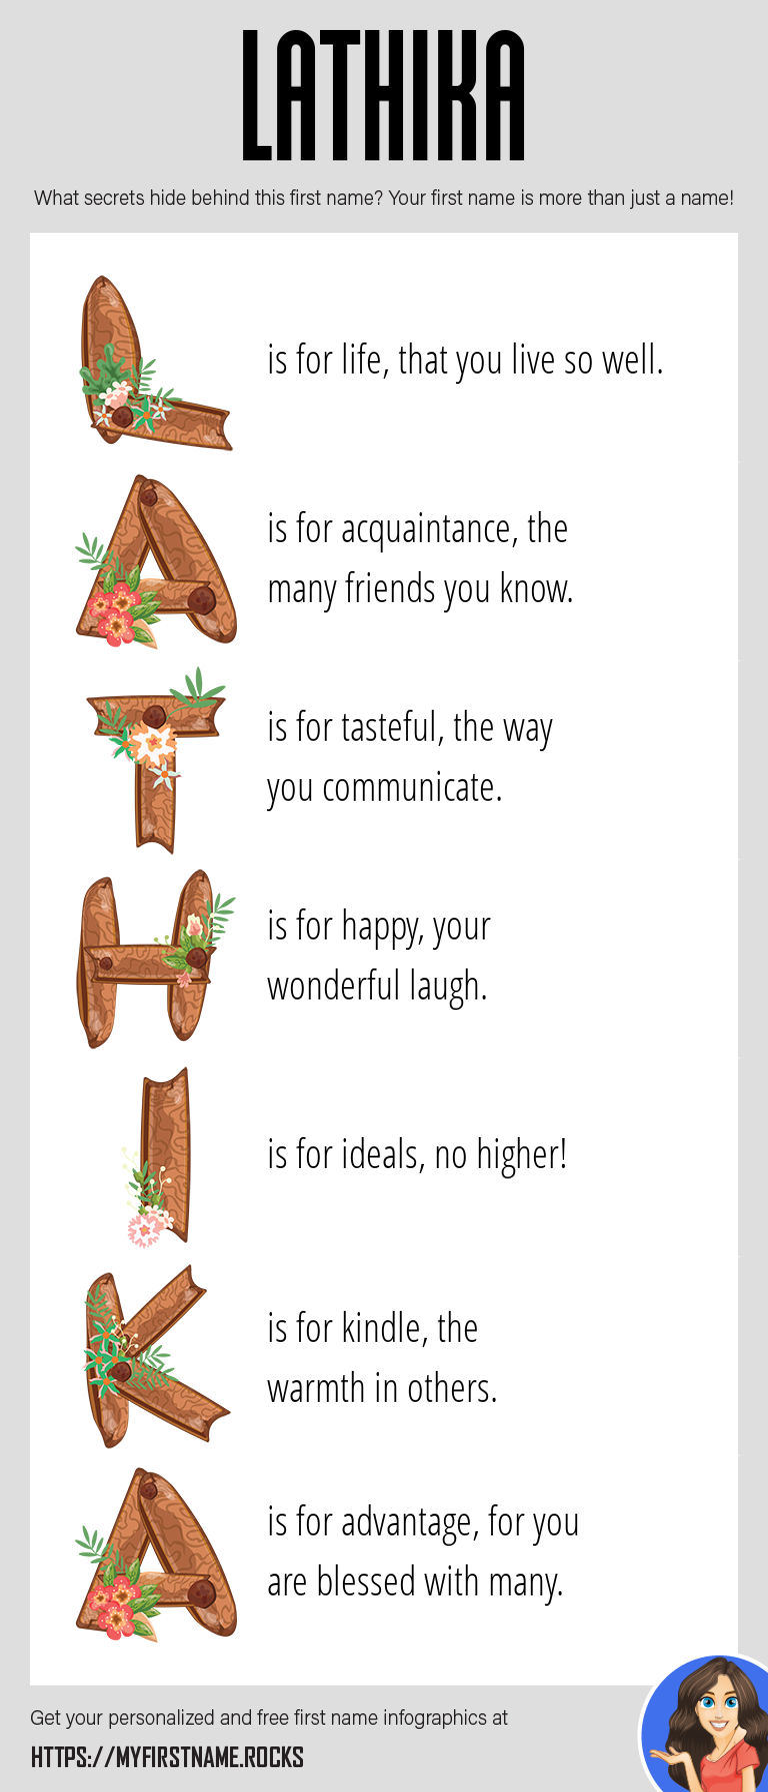 Lathika Infographics